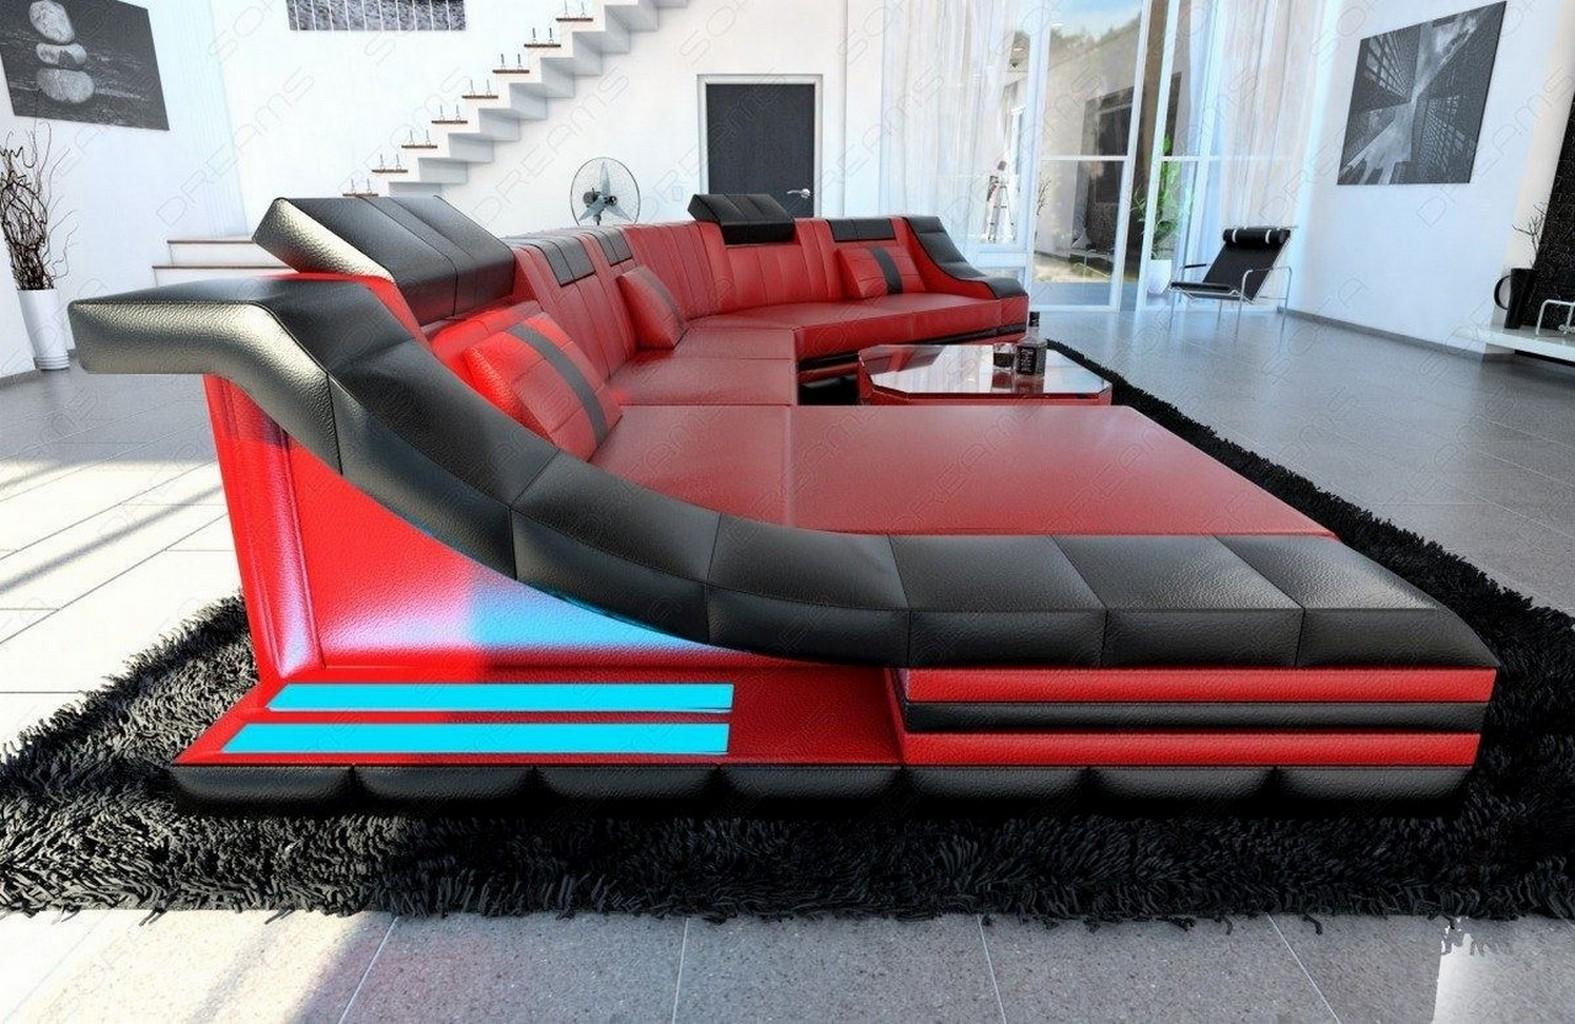 Luxury sectional sofa luxury sectional sofas thesofa for Wohnlandschaft sofa